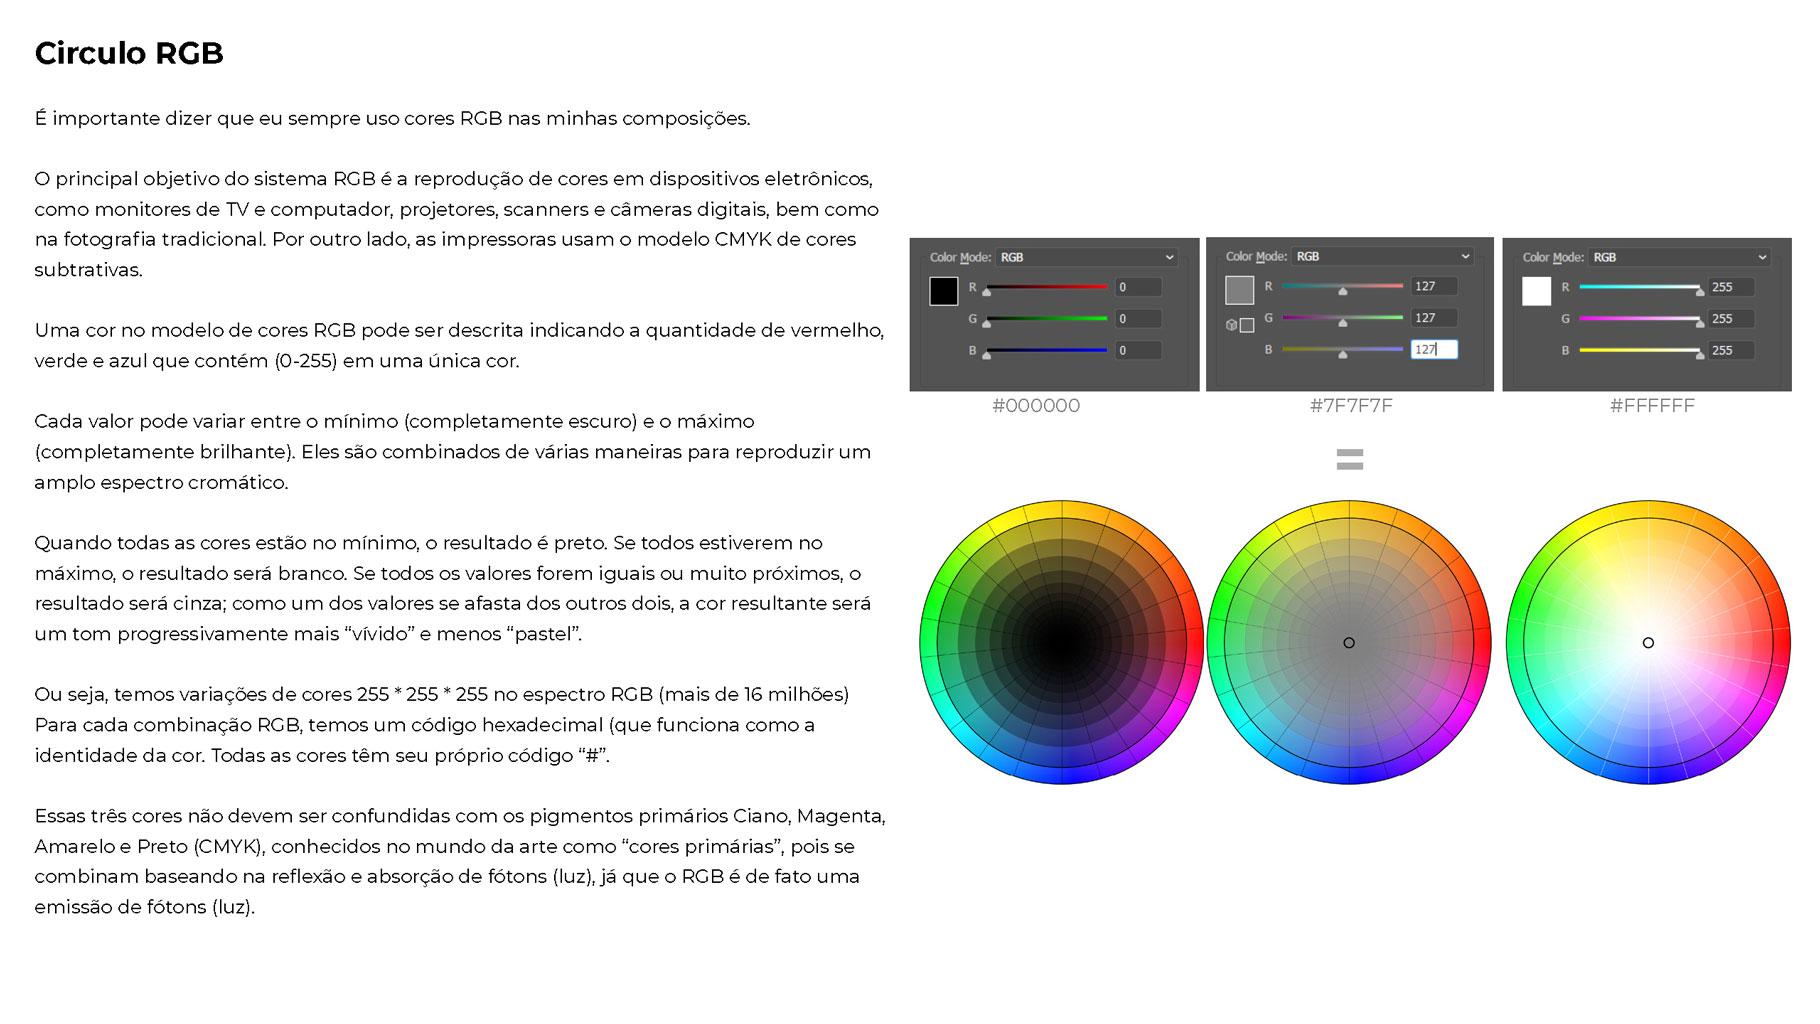 [淘宝购买] 300款色彩亮丽蒸汽波风动画绘画色板色轮模板素材 300 Color Swatches For Adobe Illustrator & Adobe Photoshop插图(2)